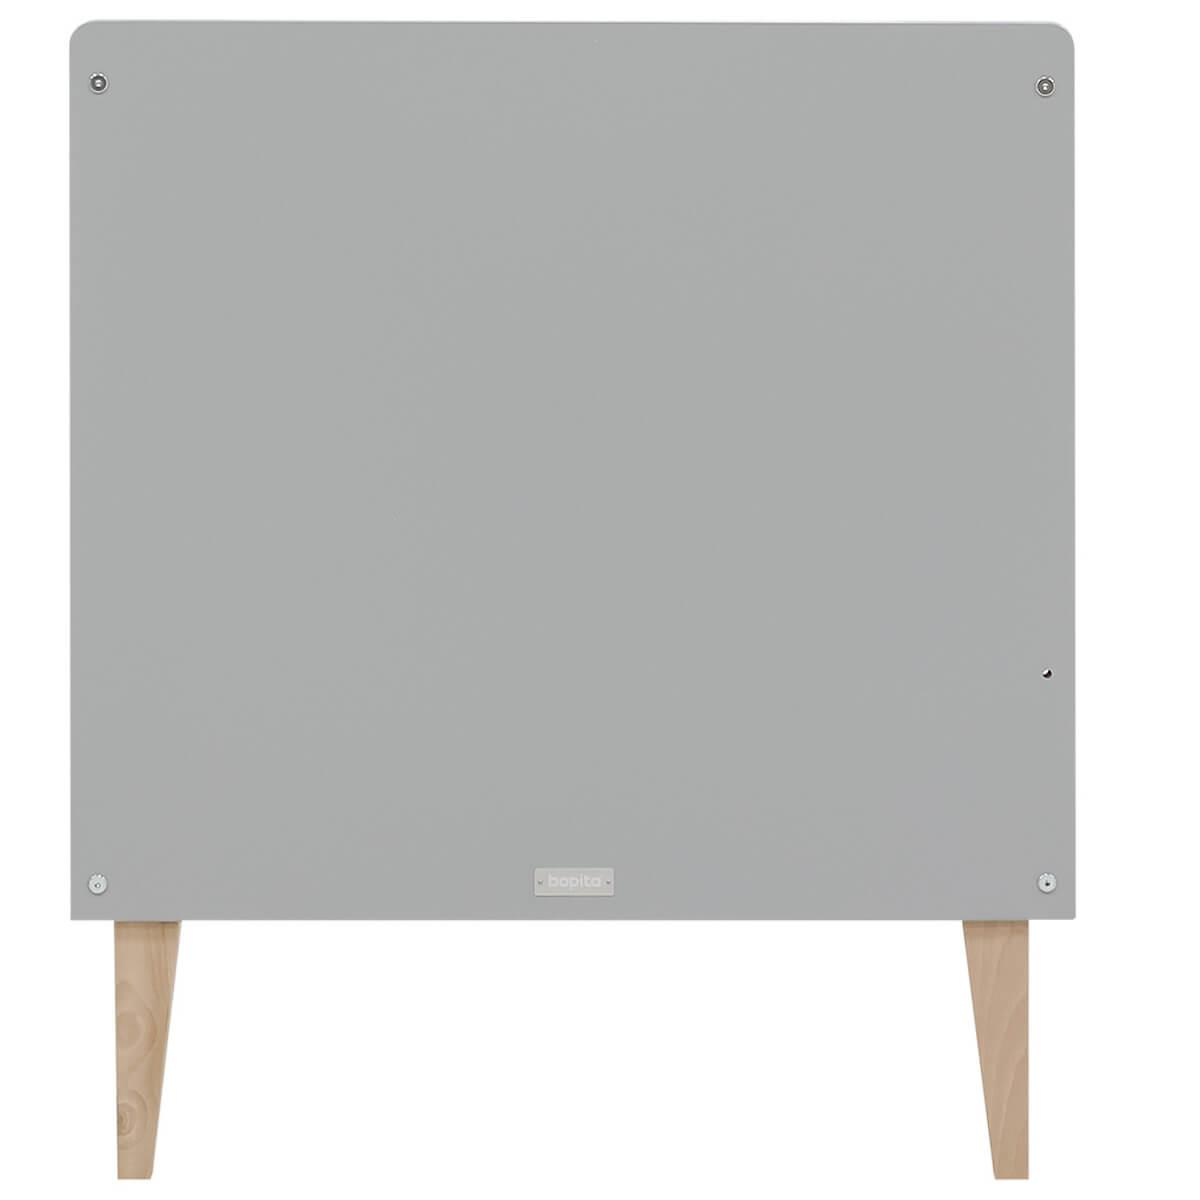 Cuna evolutiva 70x140cm EMMA Bopita blanco-gris